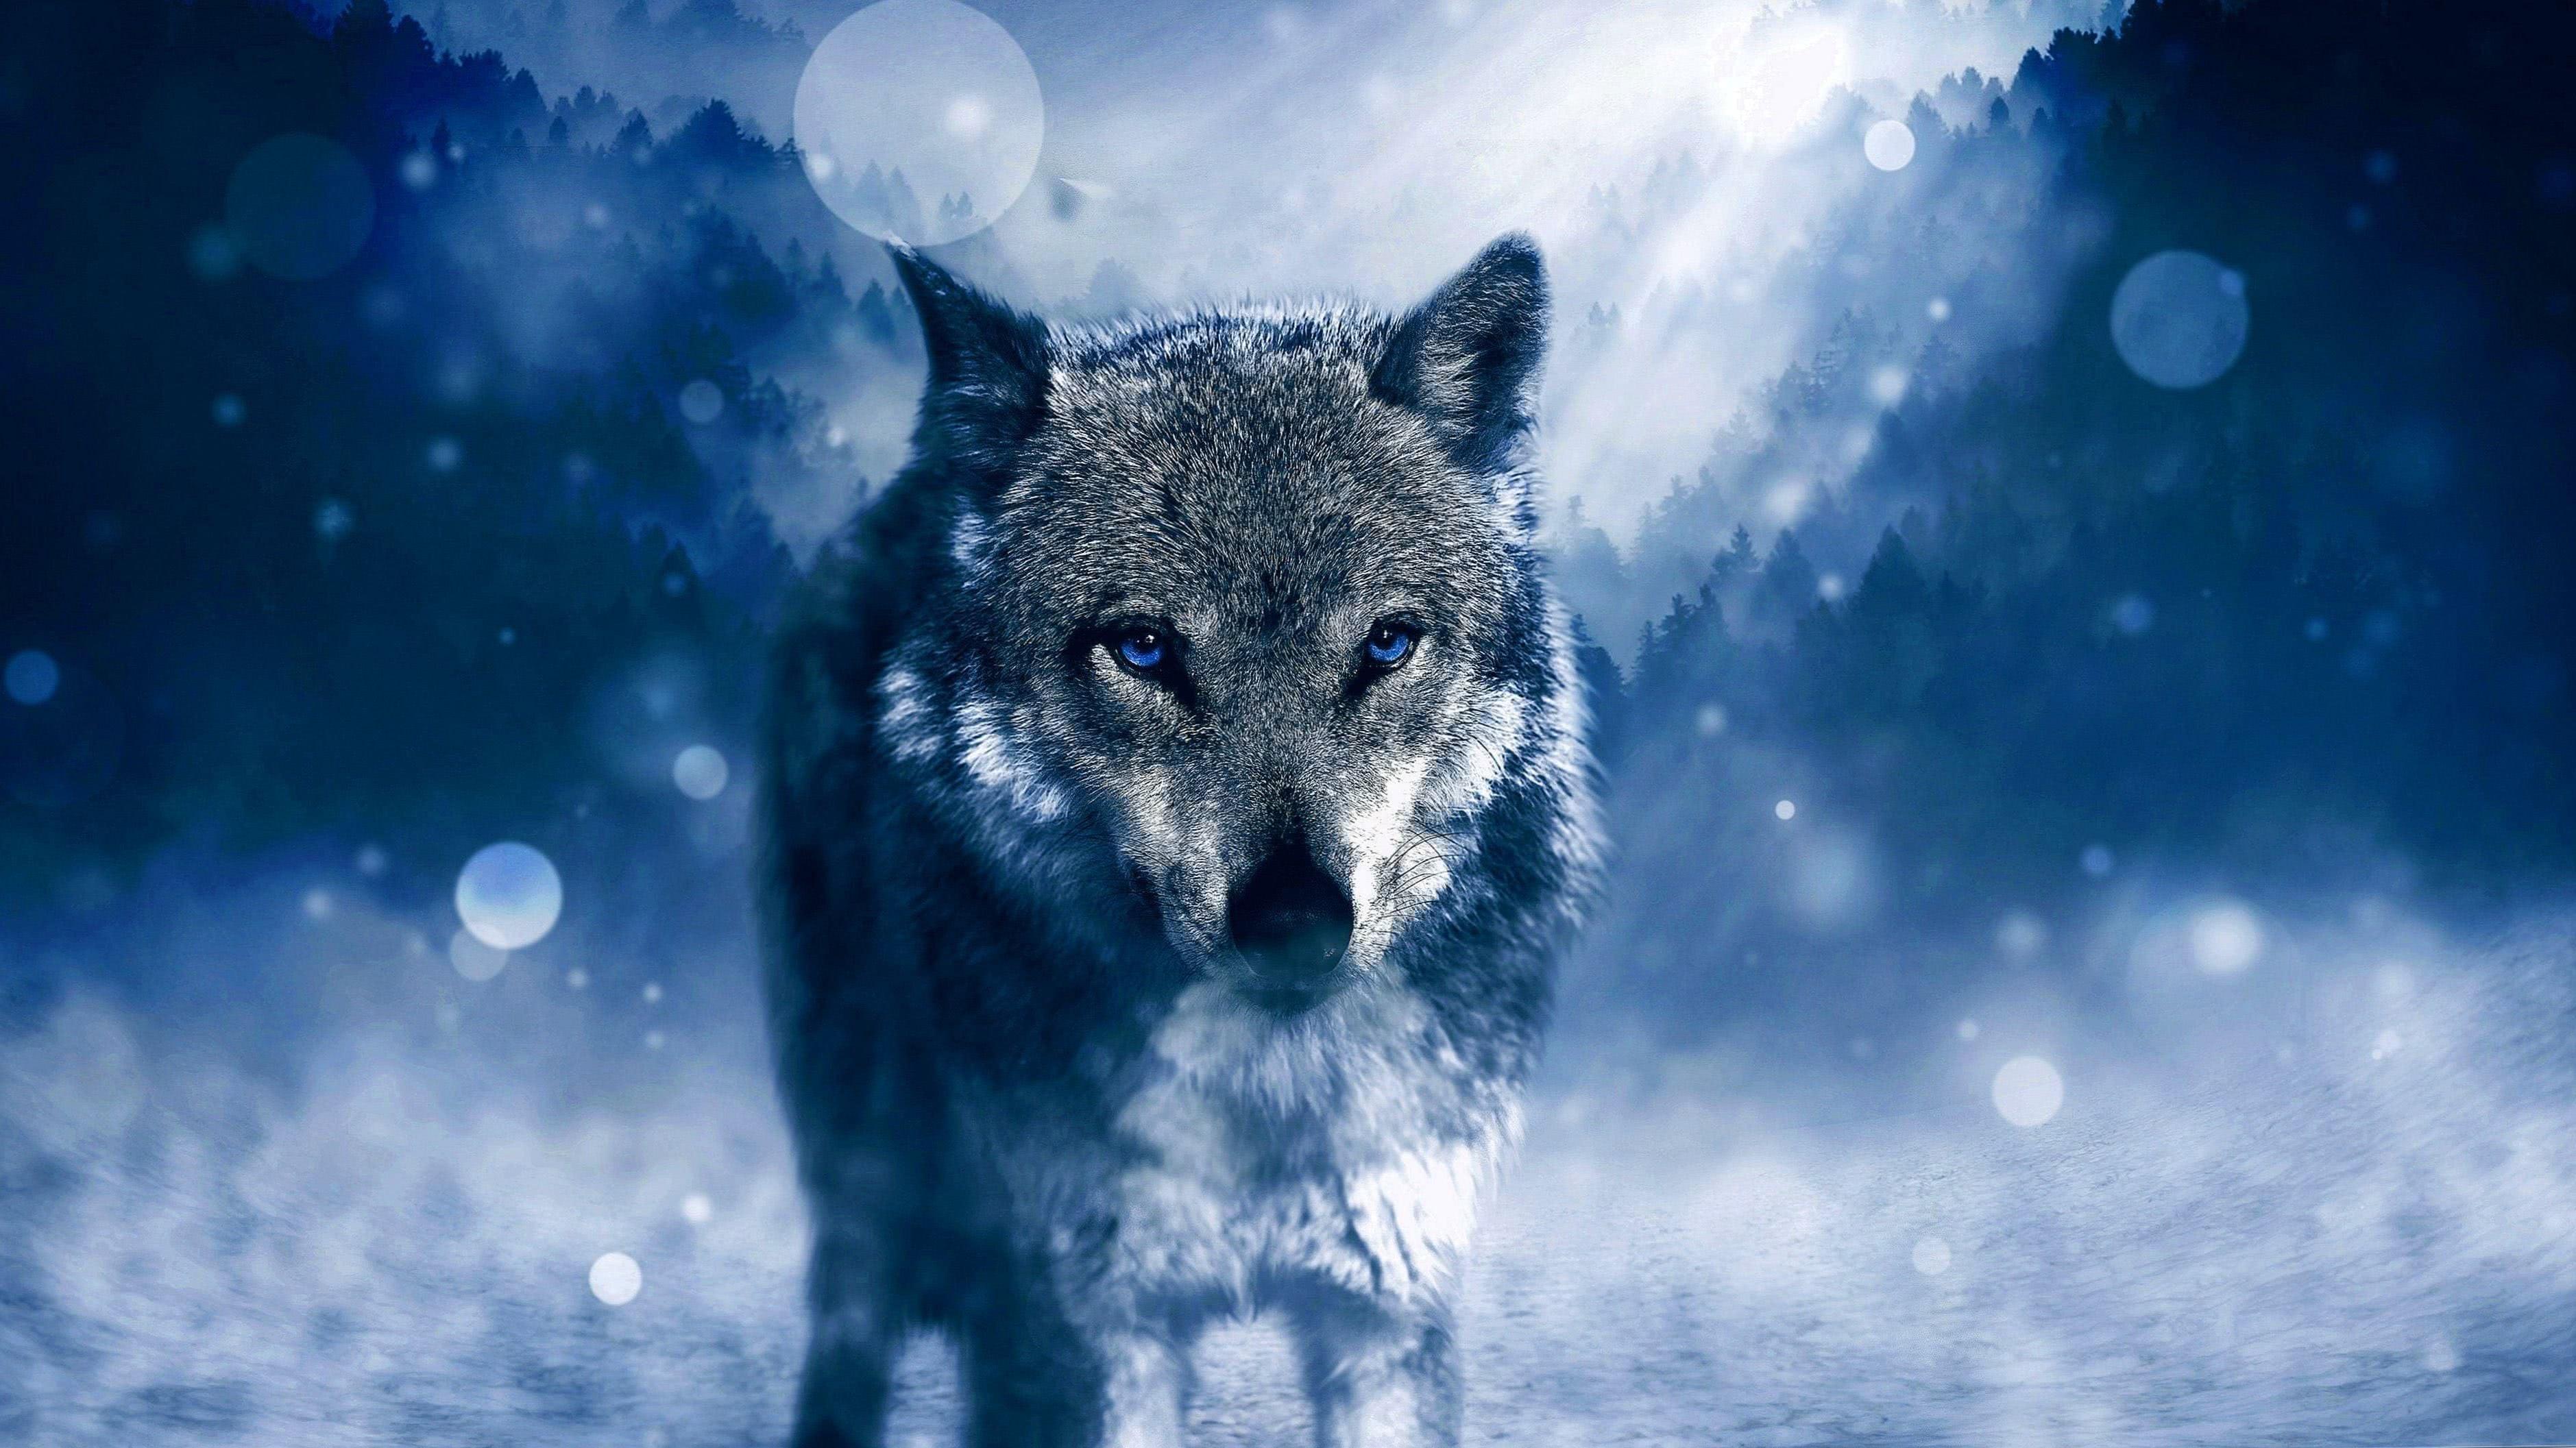 Wallpapers Ultra HD 4K Wolf